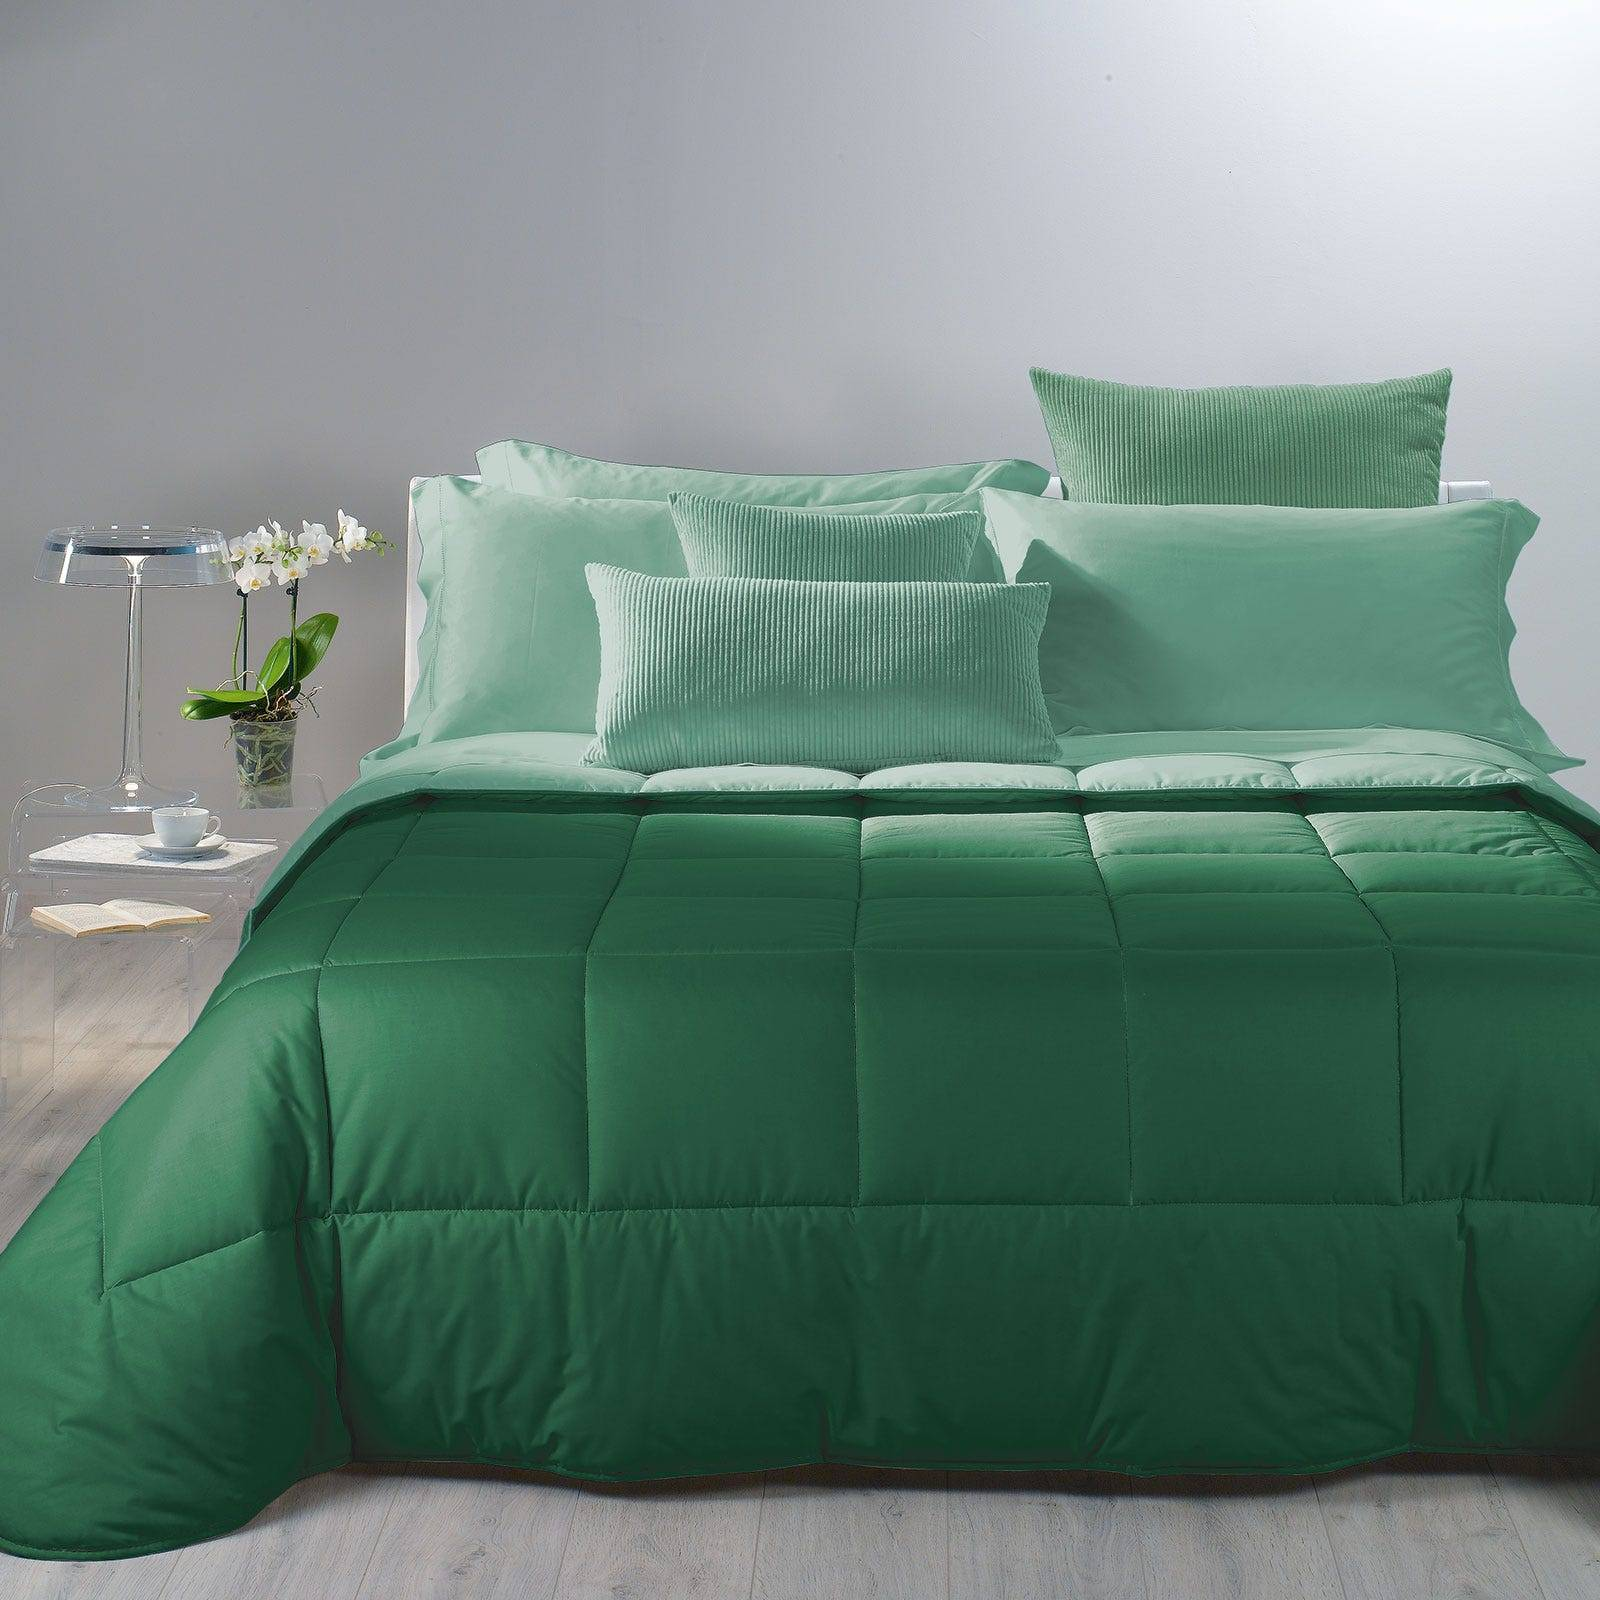 Caleffi Trapunta Bicolor Matrimoniale Verde in Cotone